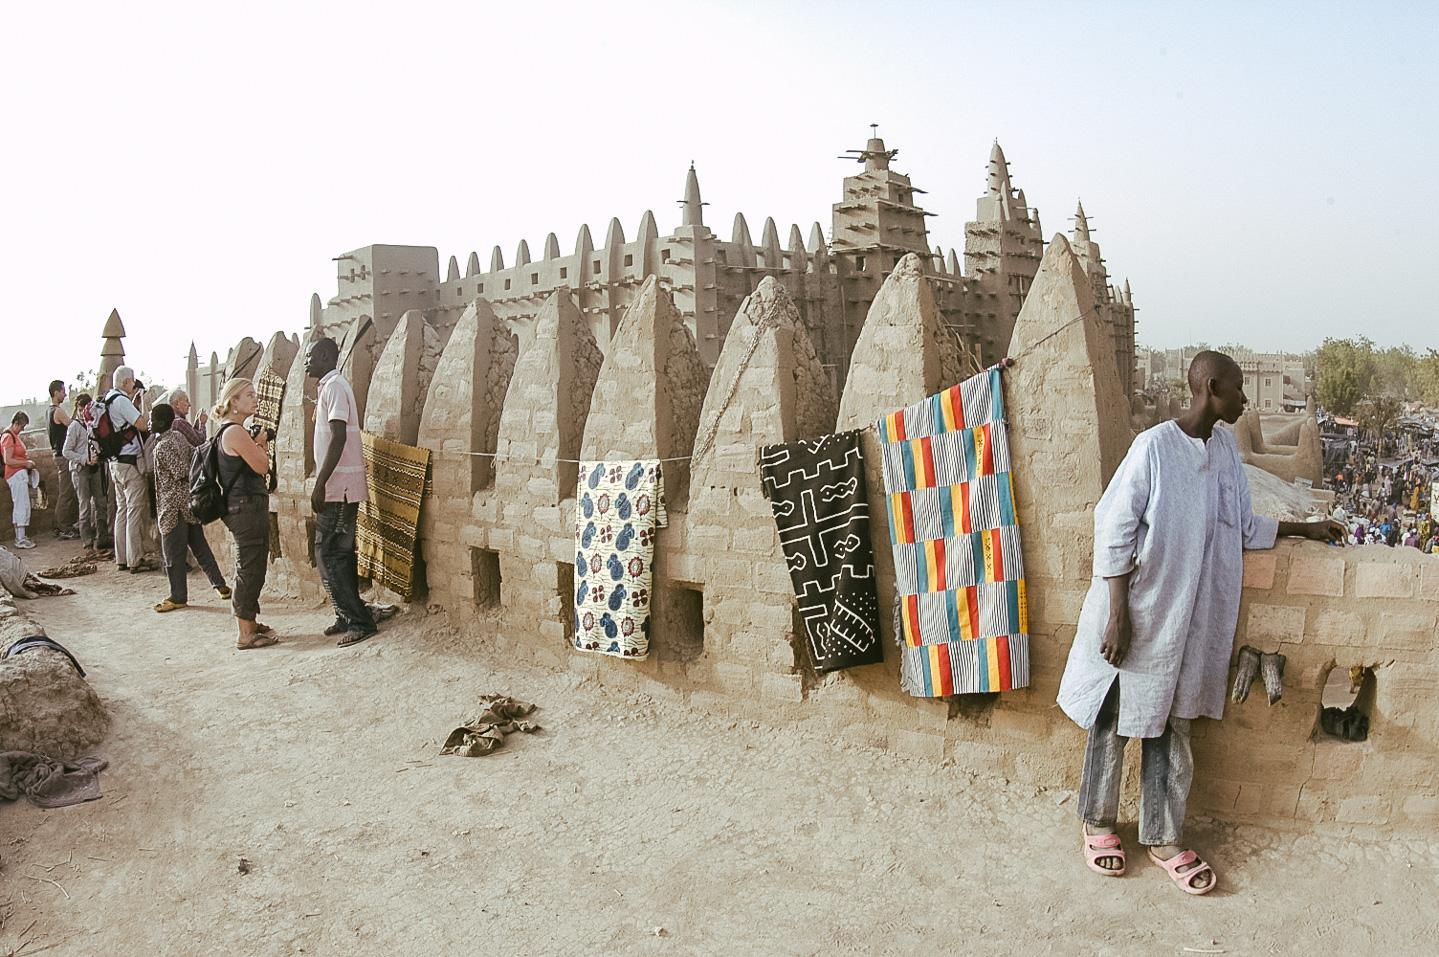 Rund um Afrika - Mali - Westafrika - Transafrika-441